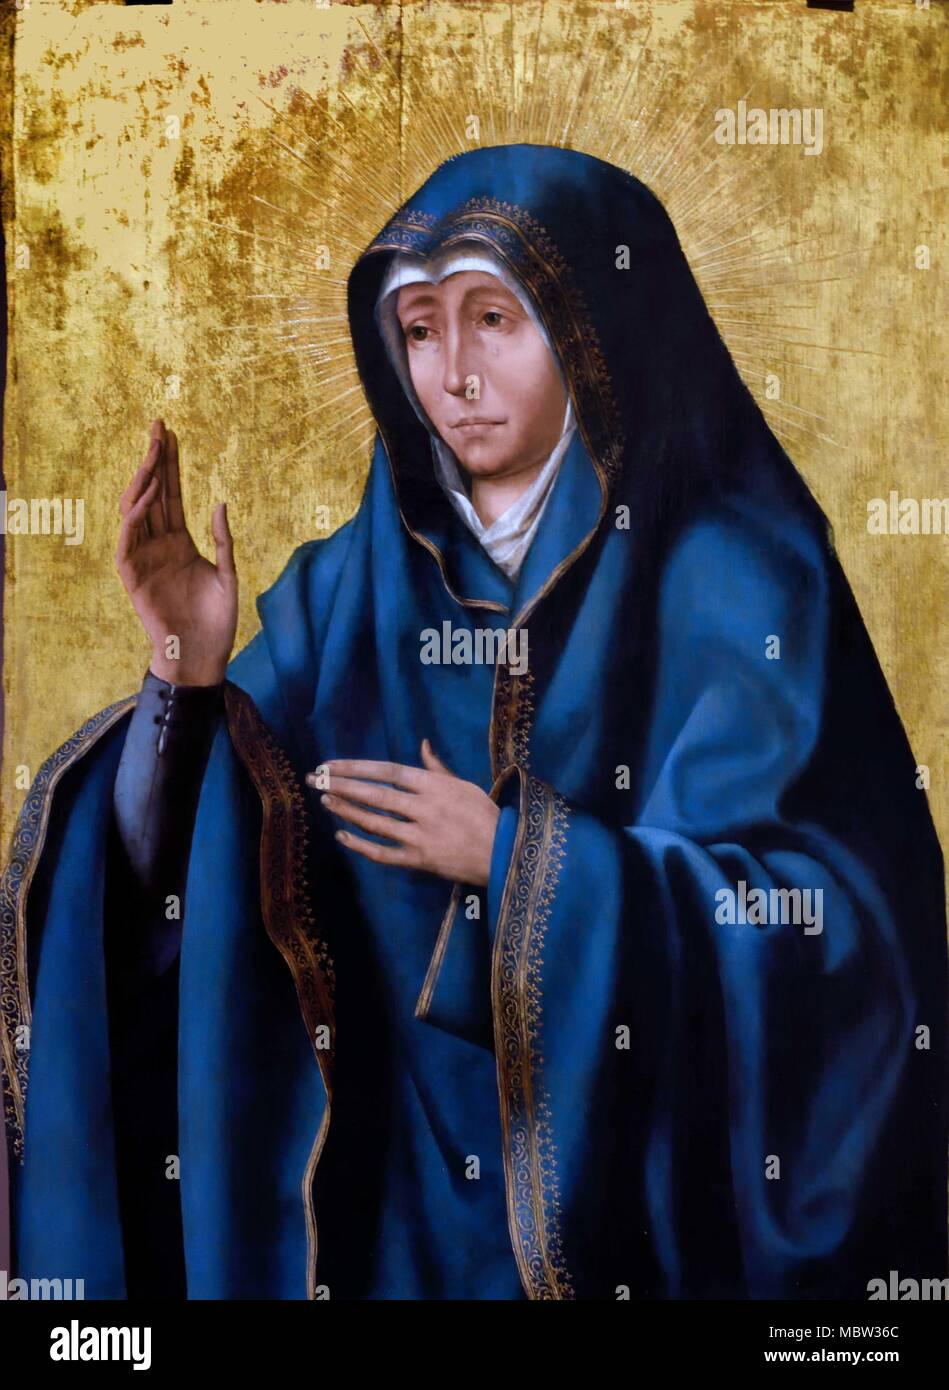 Madre dei dolori - Mother of pains 1520 METSYS Quentin 1466-1530 Belgian Flemish Belgium 15th-16th Century - Stock Image